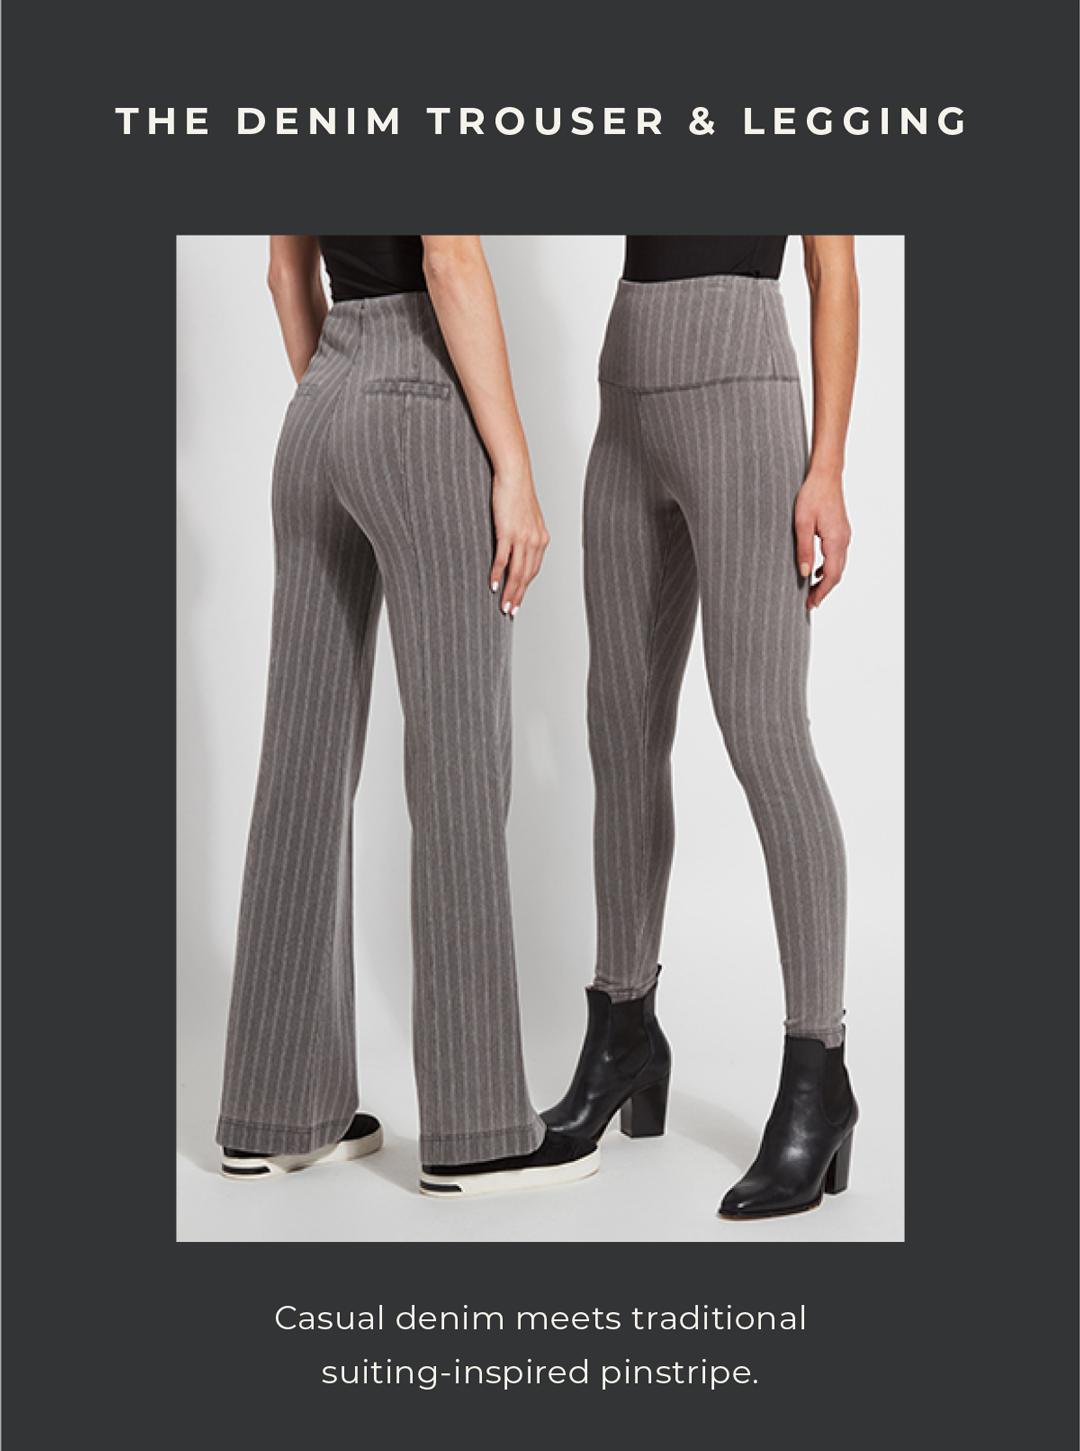 The Denim Trouser and Legging